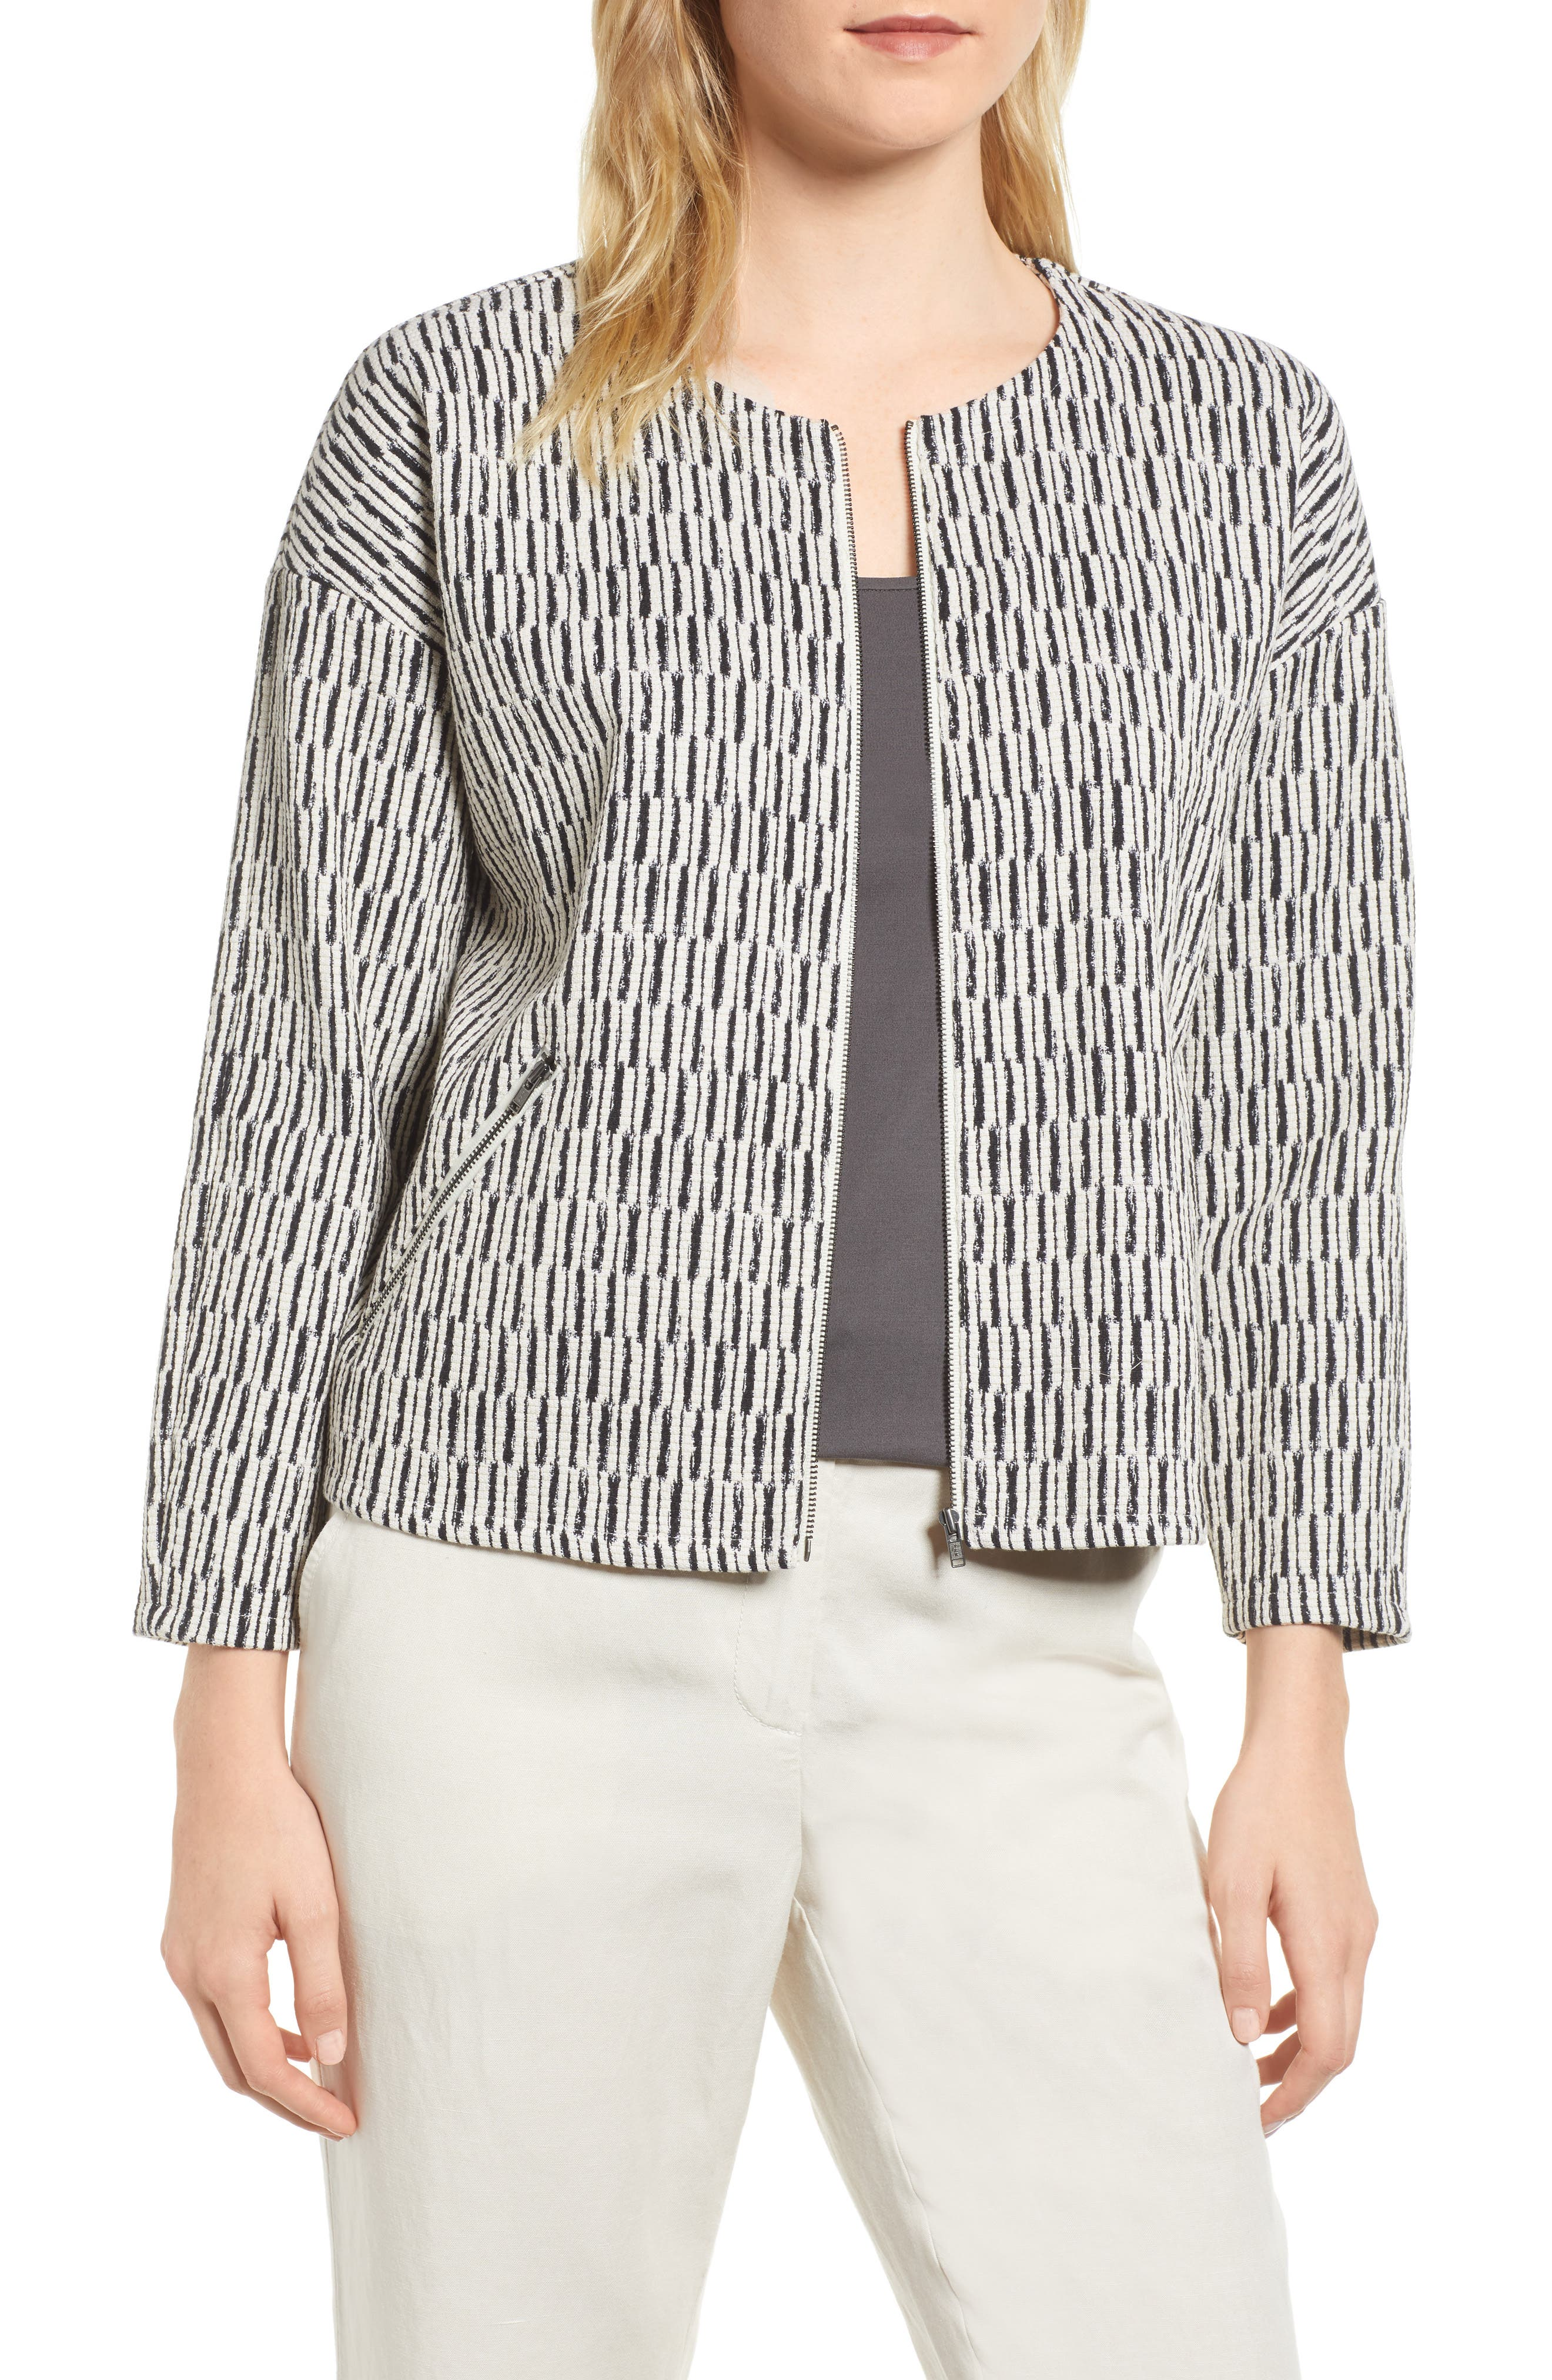 Tweed Jacket,                             Main thumbnail 1, color,                             Black/ White